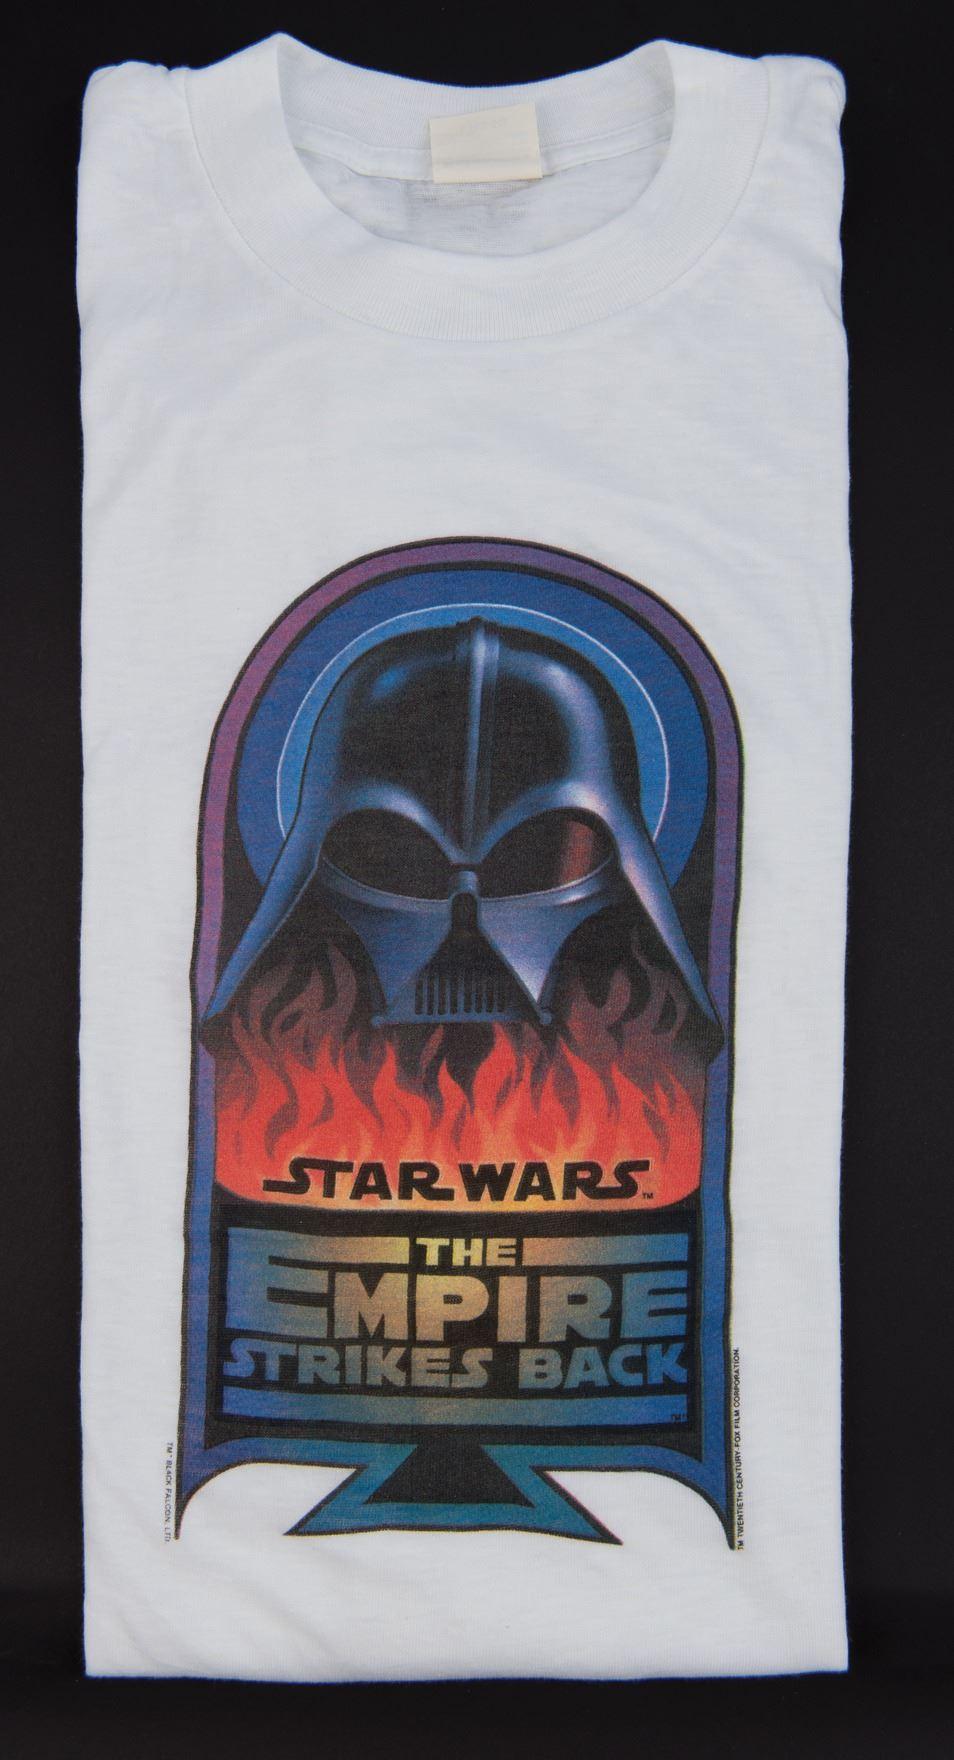 125c5a6b Star Wars: The Empire Strikes Back rare vintage 1979